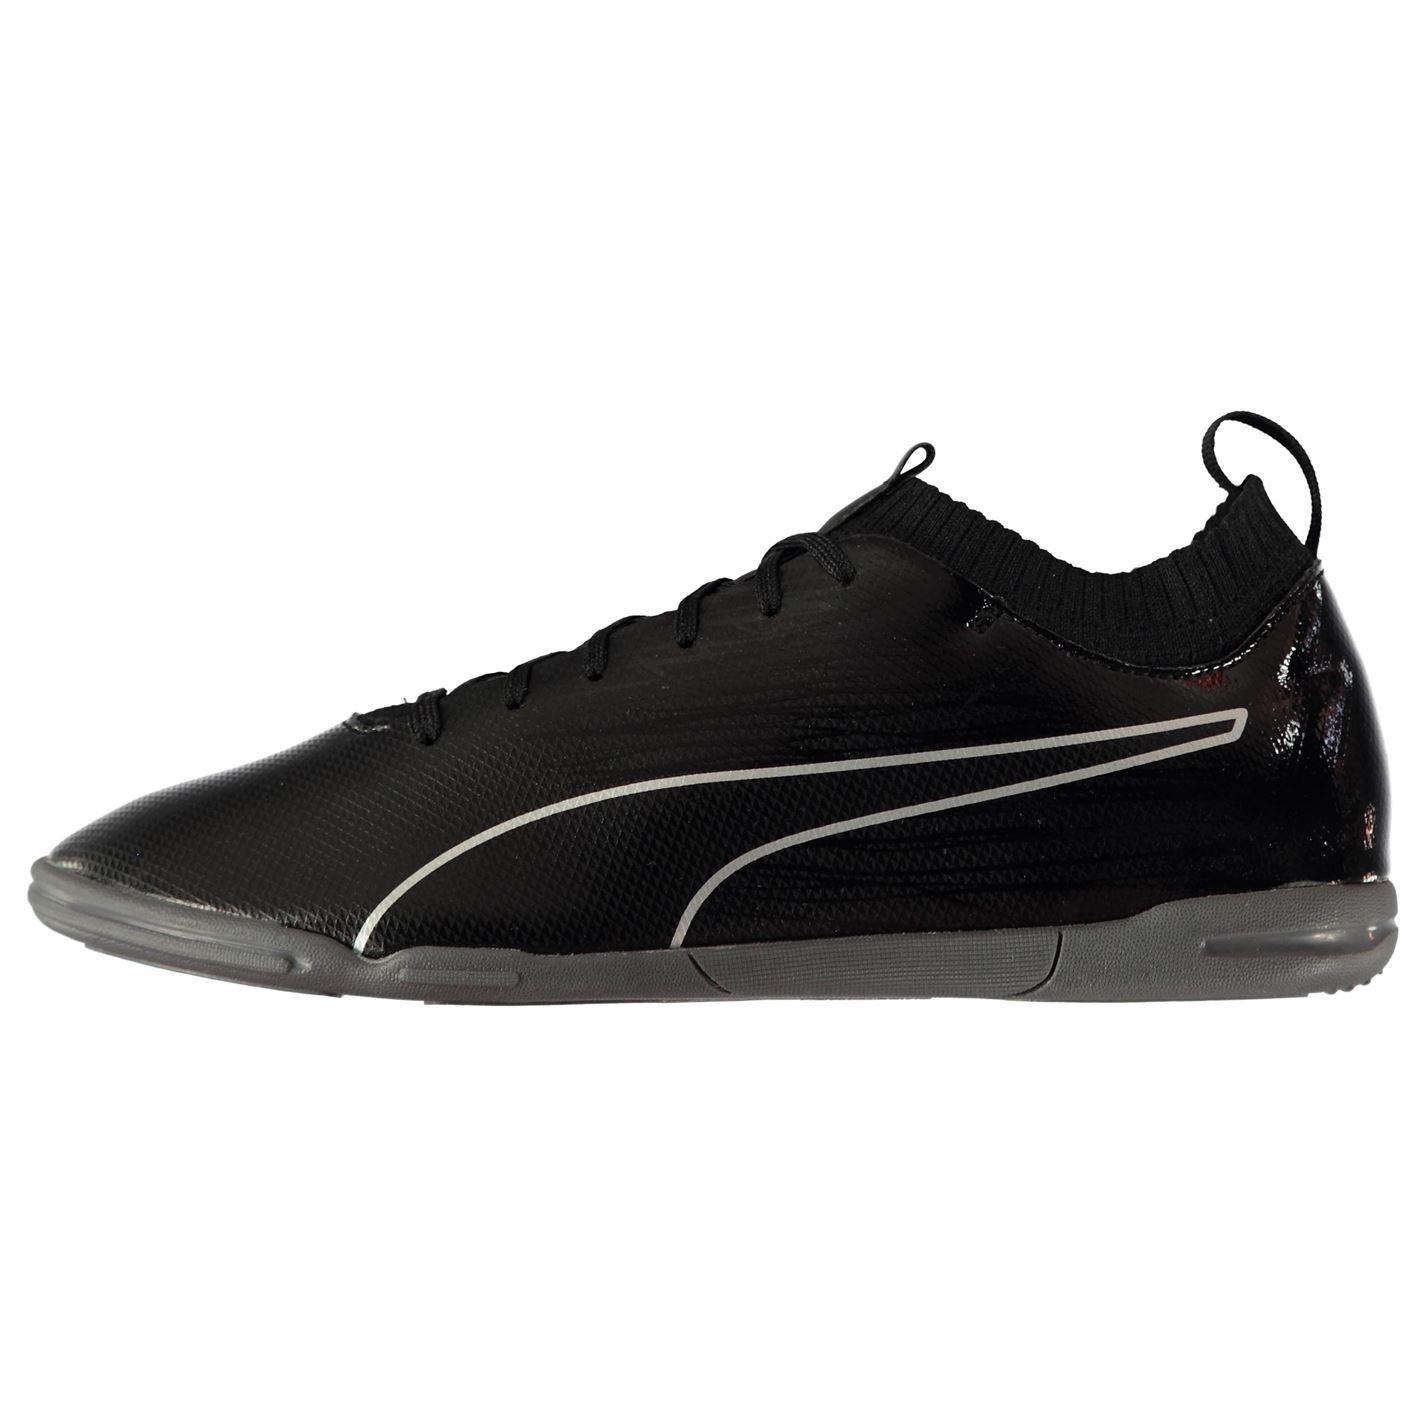 bb40bf4d5 ... Puma evoKNIT Indoor Football Trainers Mens Black Soccer Futsal Shoes  Sneakers ...